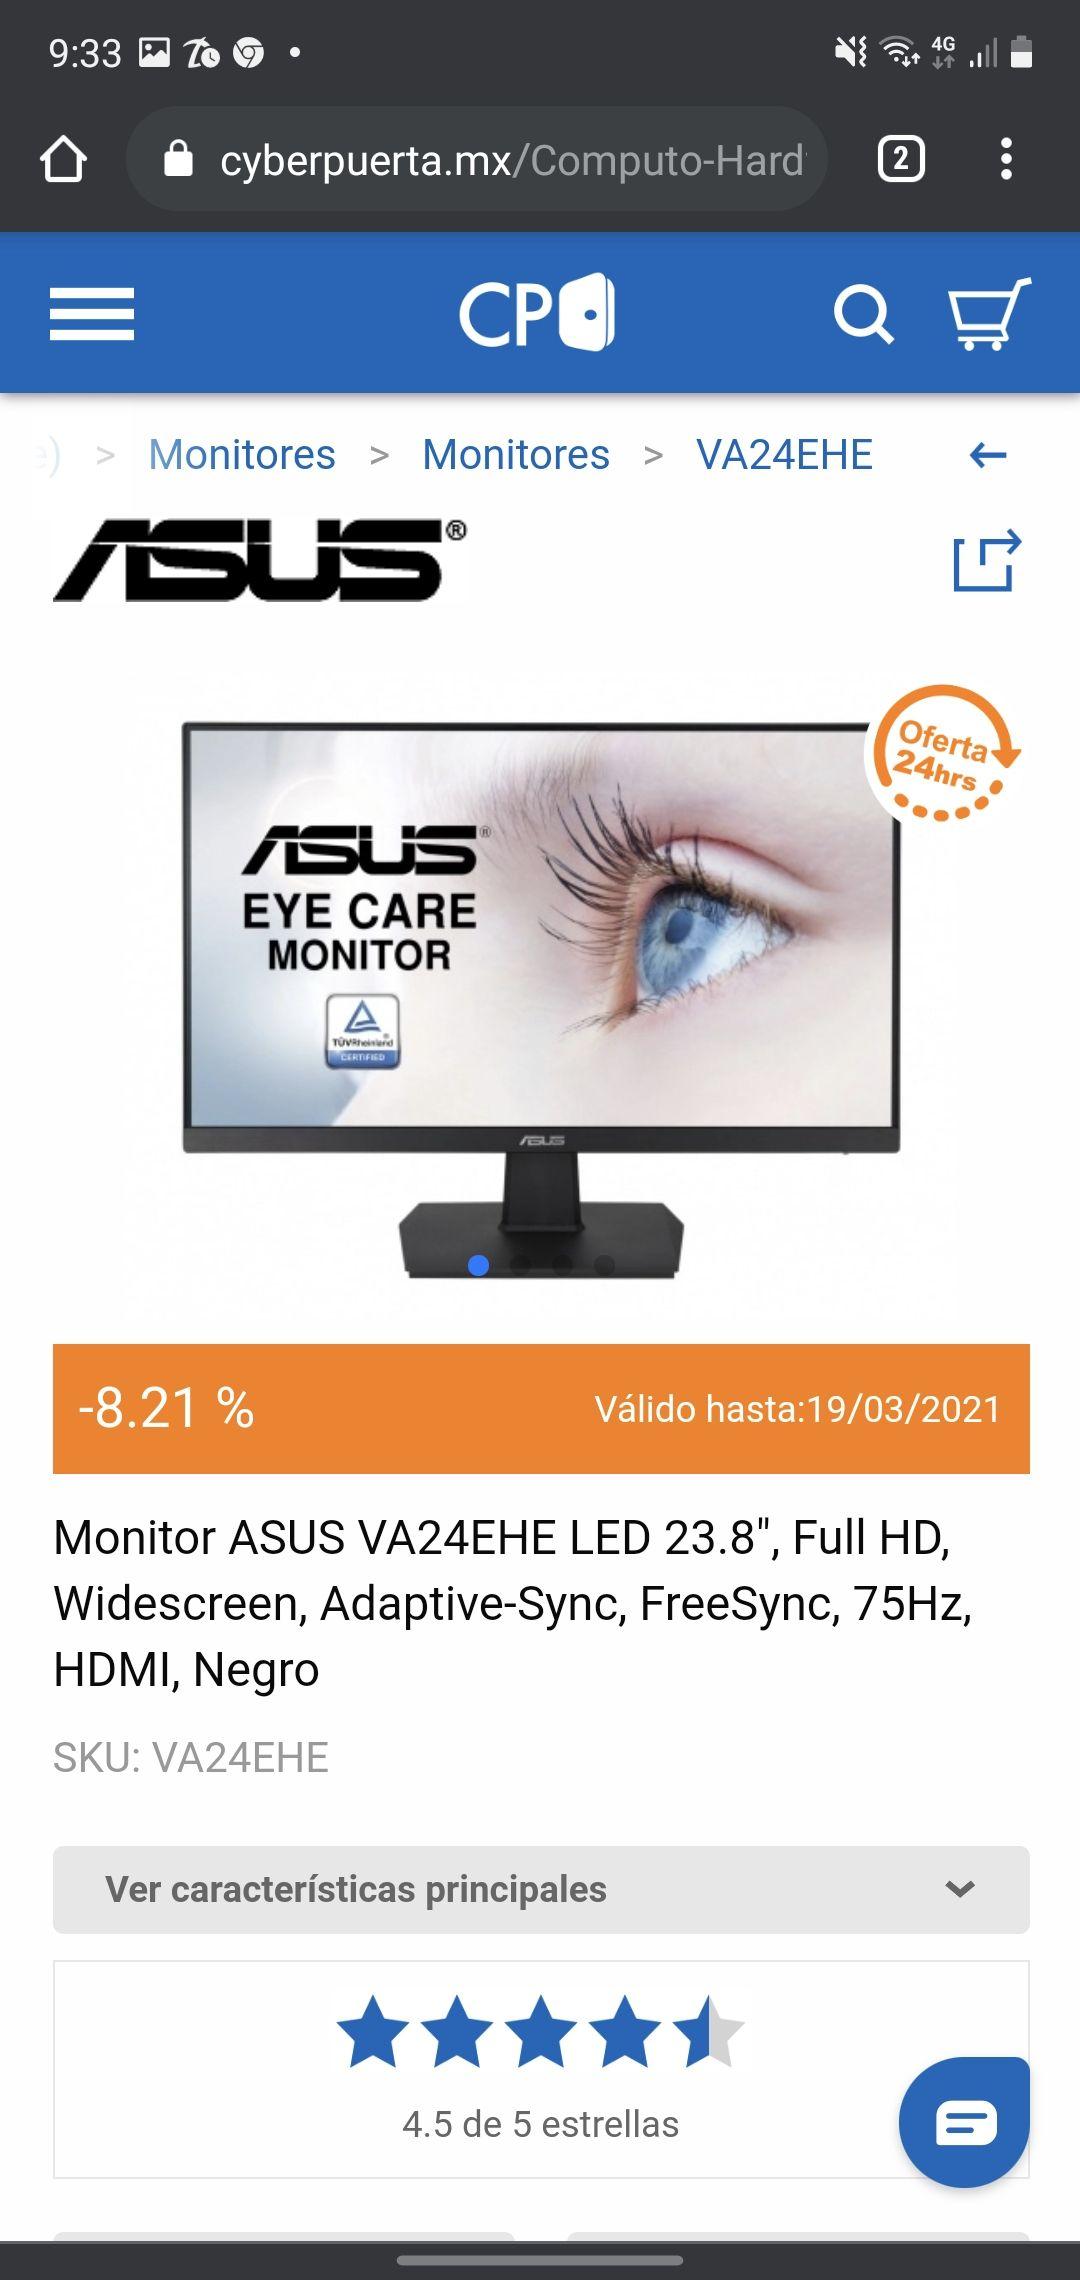 "Cyberpuerta, Monitor ASUS VA24EHE LED 23.8"", Full HD"